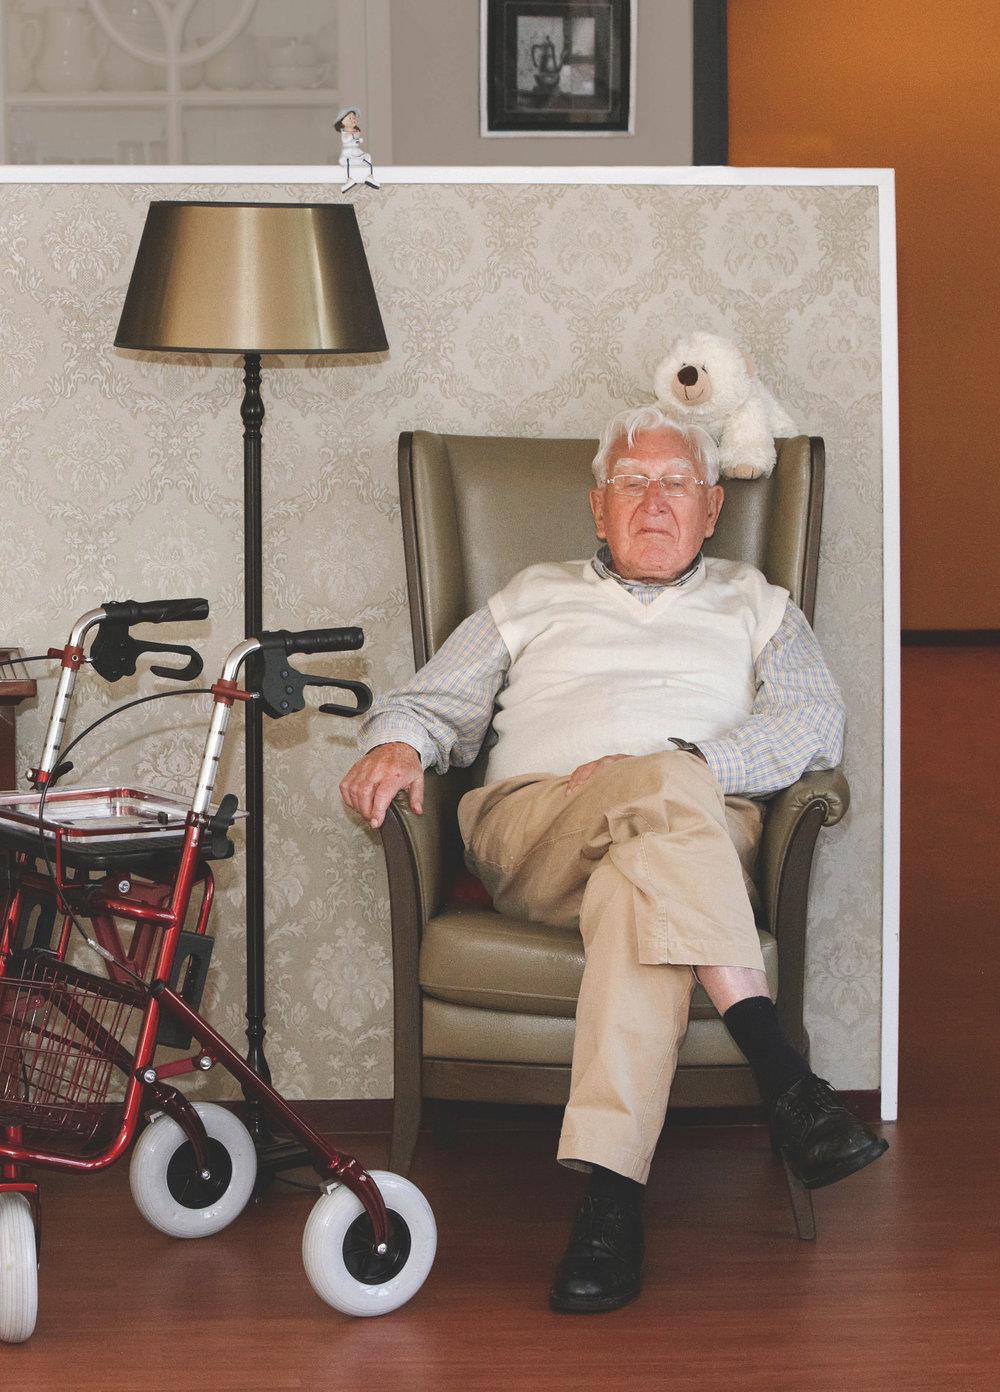 A resident of the Korongee dementia vilage in Tasmania. Photo by Anita Edridge